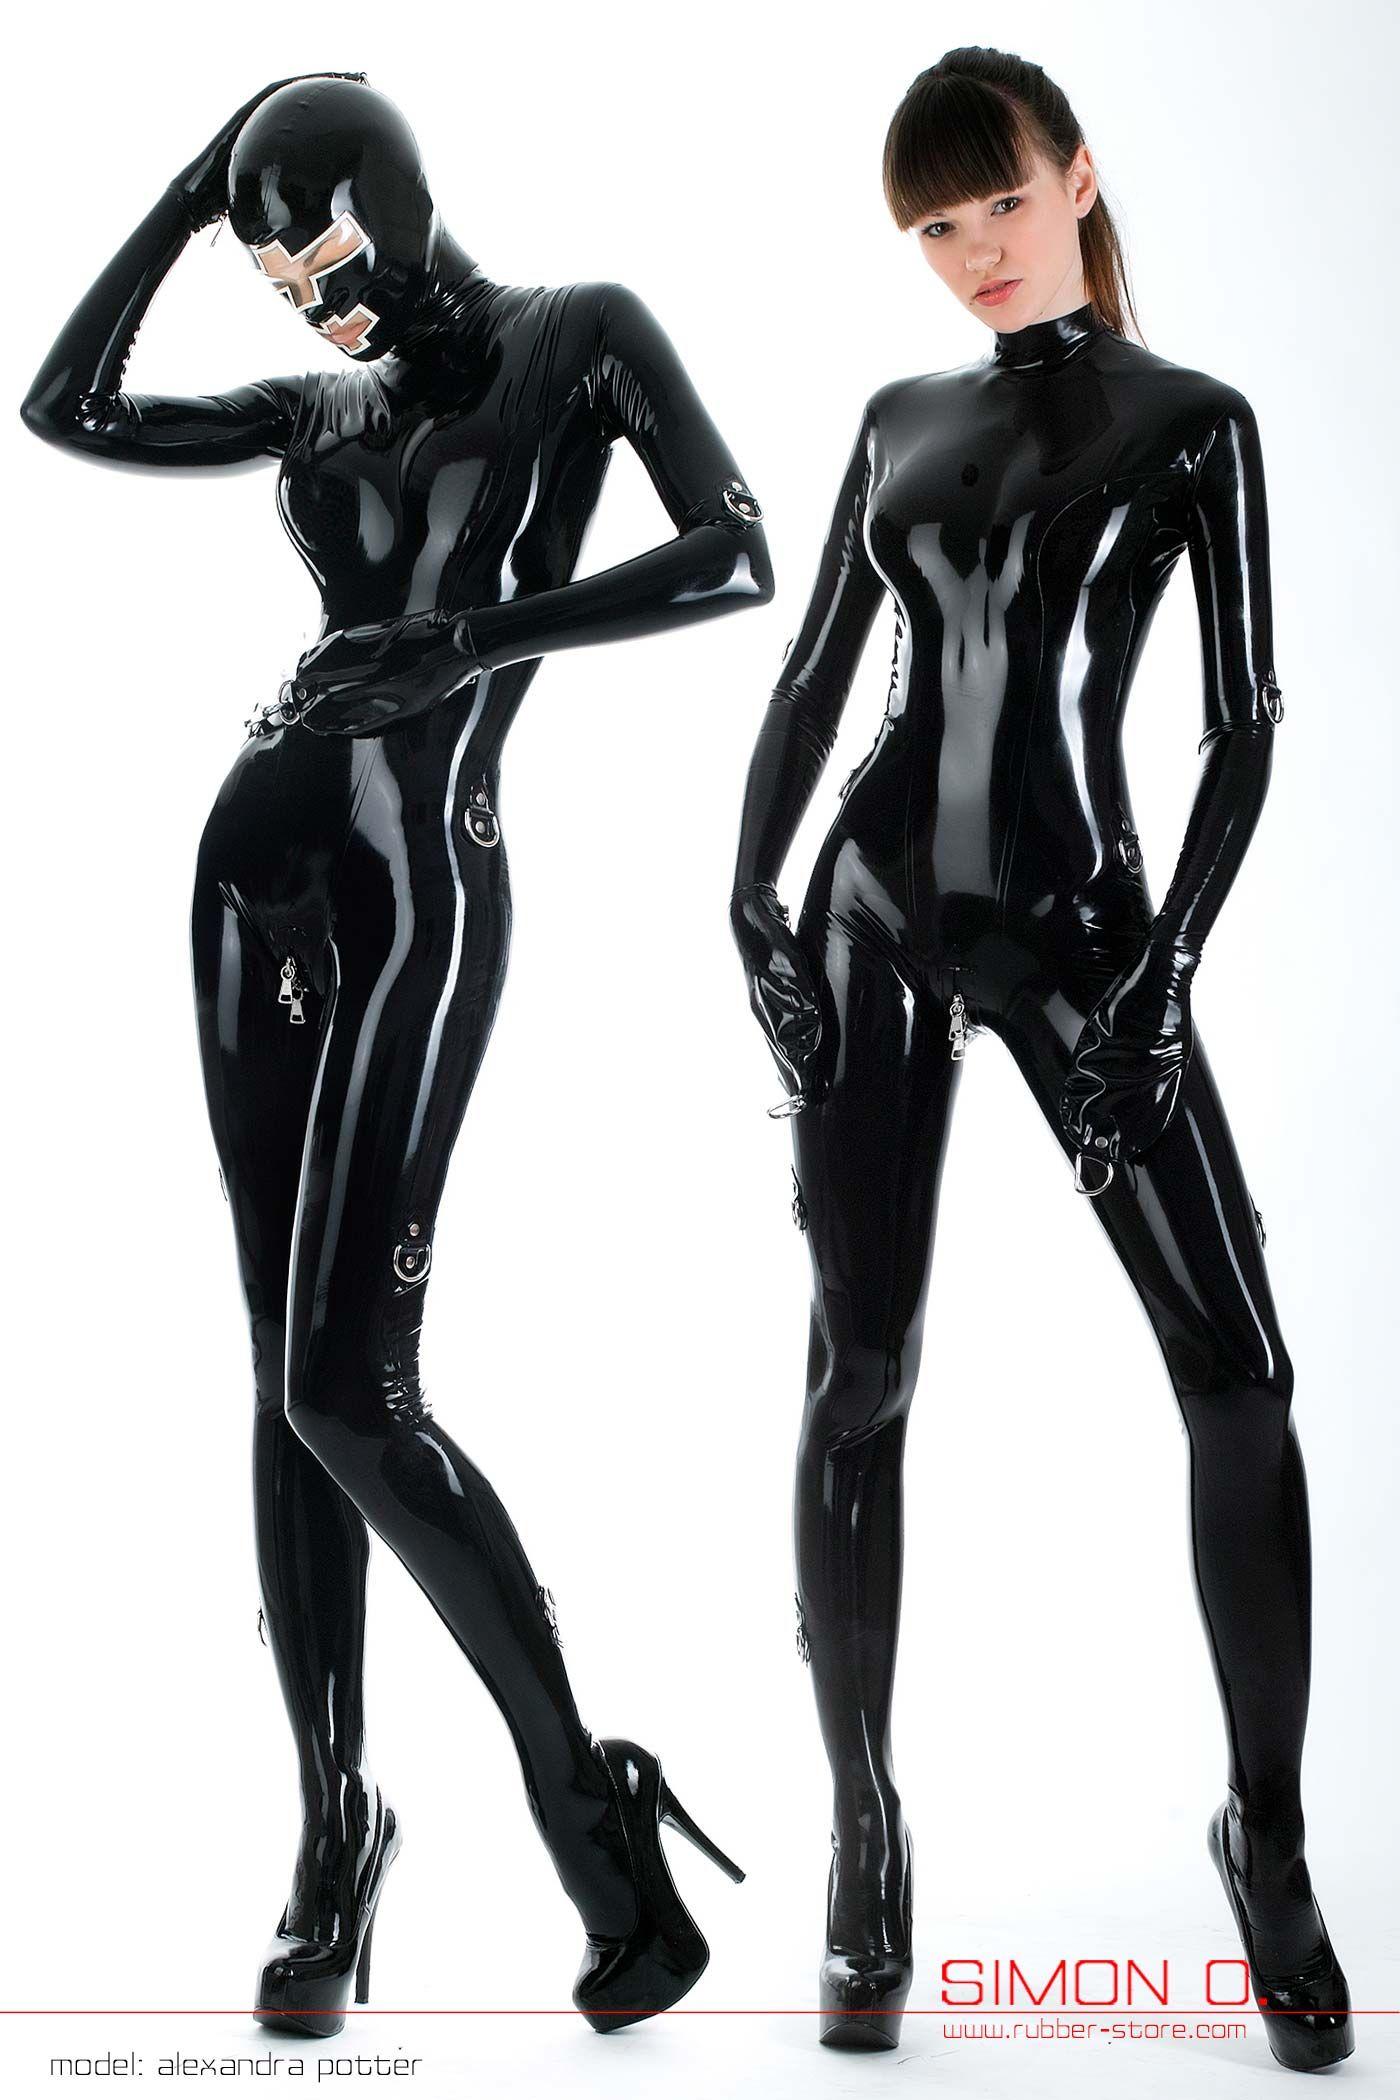 Ebay auction virginity